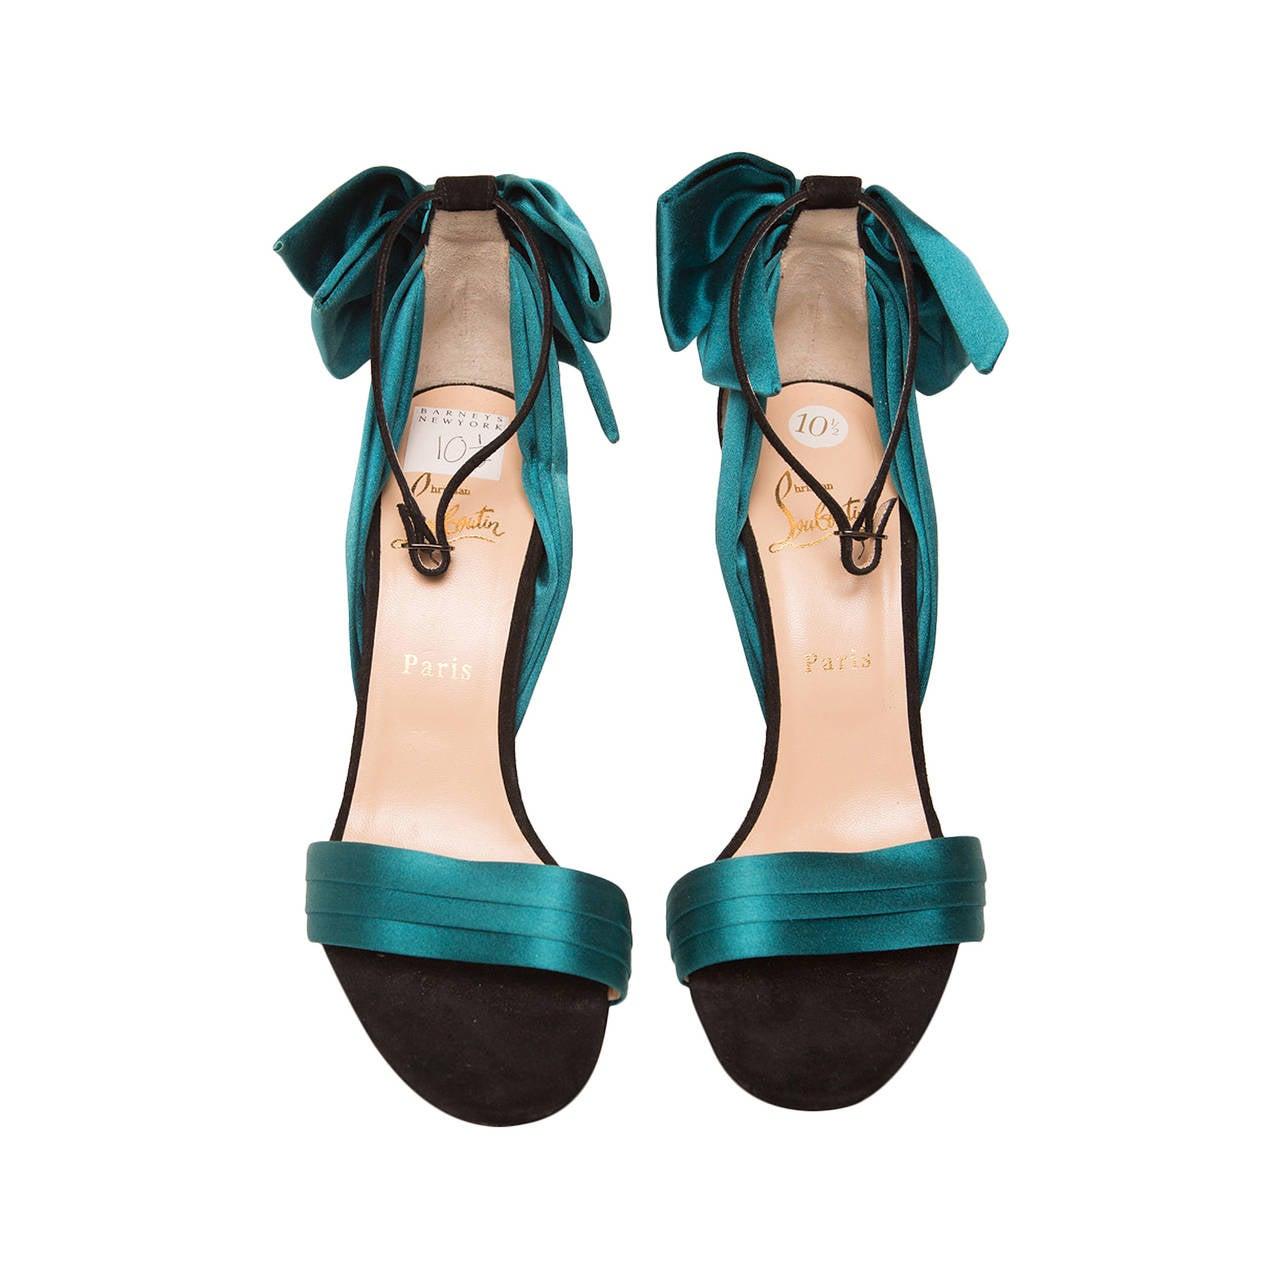 Christian Louboutin Teal High Heel Sandal For Sale